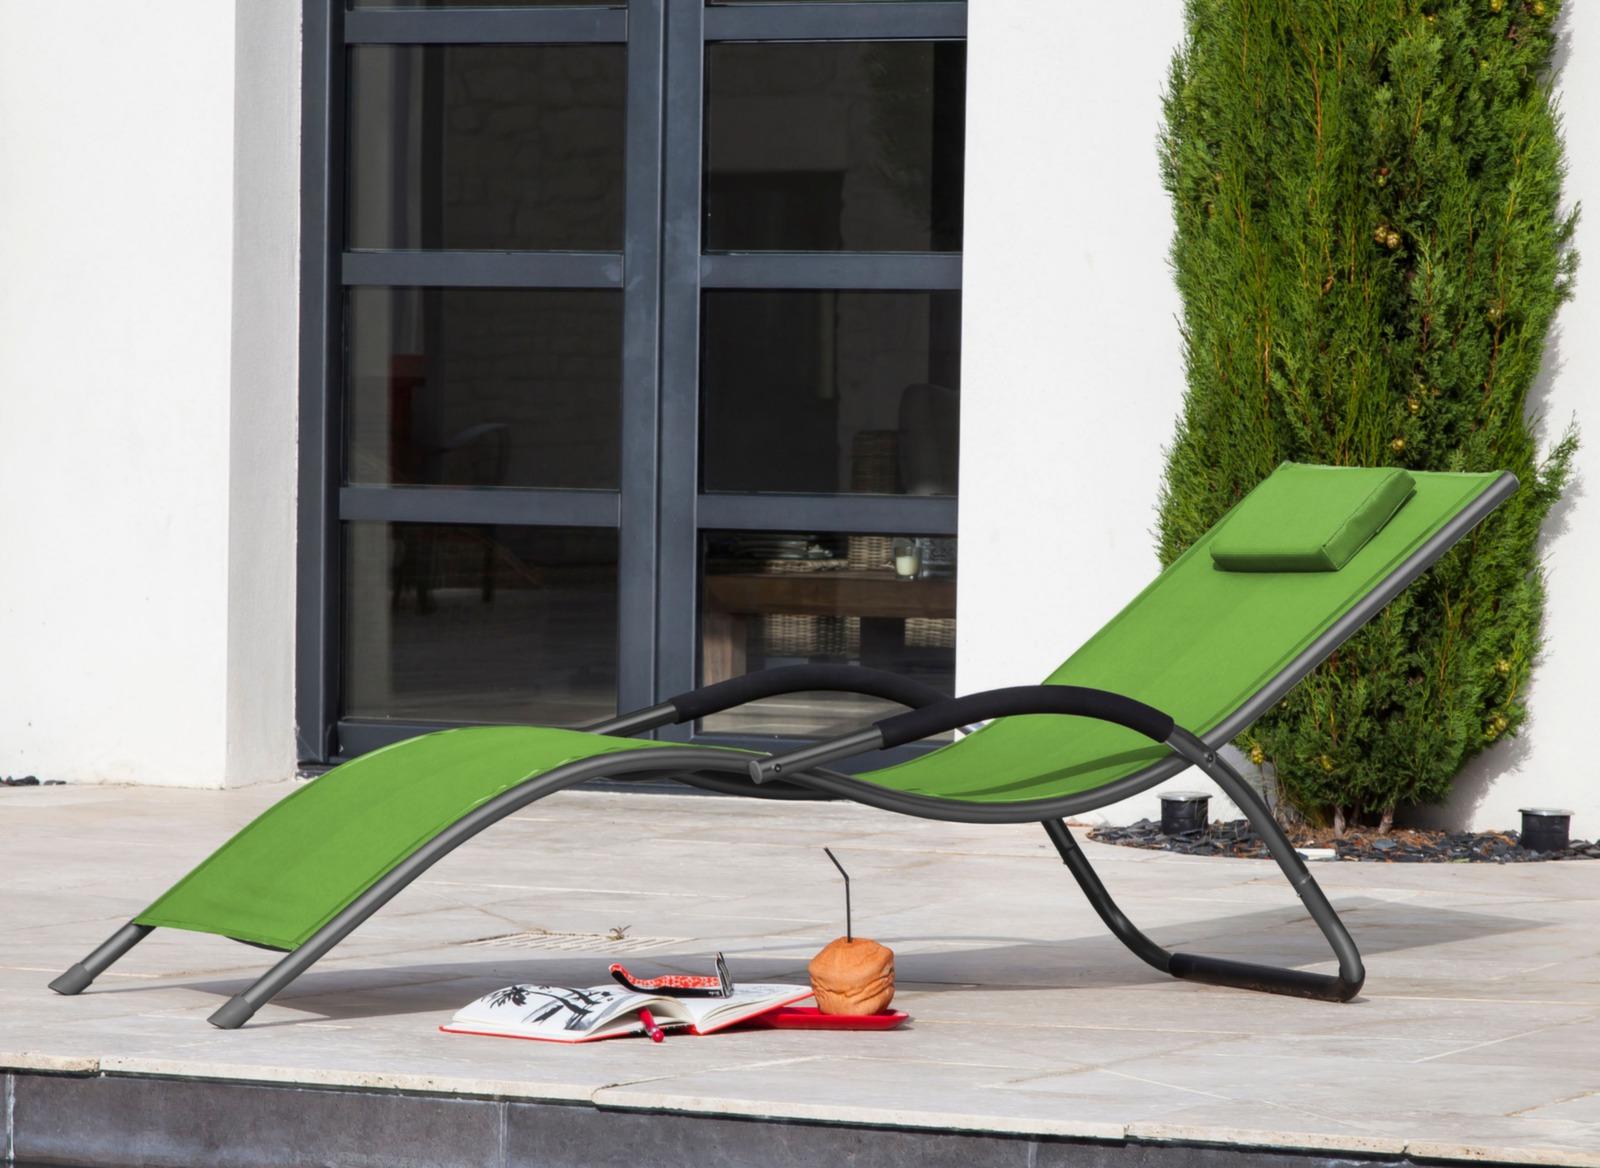 lit de soleil riva mobilier de jardin d tente proloisirs. Black Bedroom Furniture Sets. Home Design Ideas